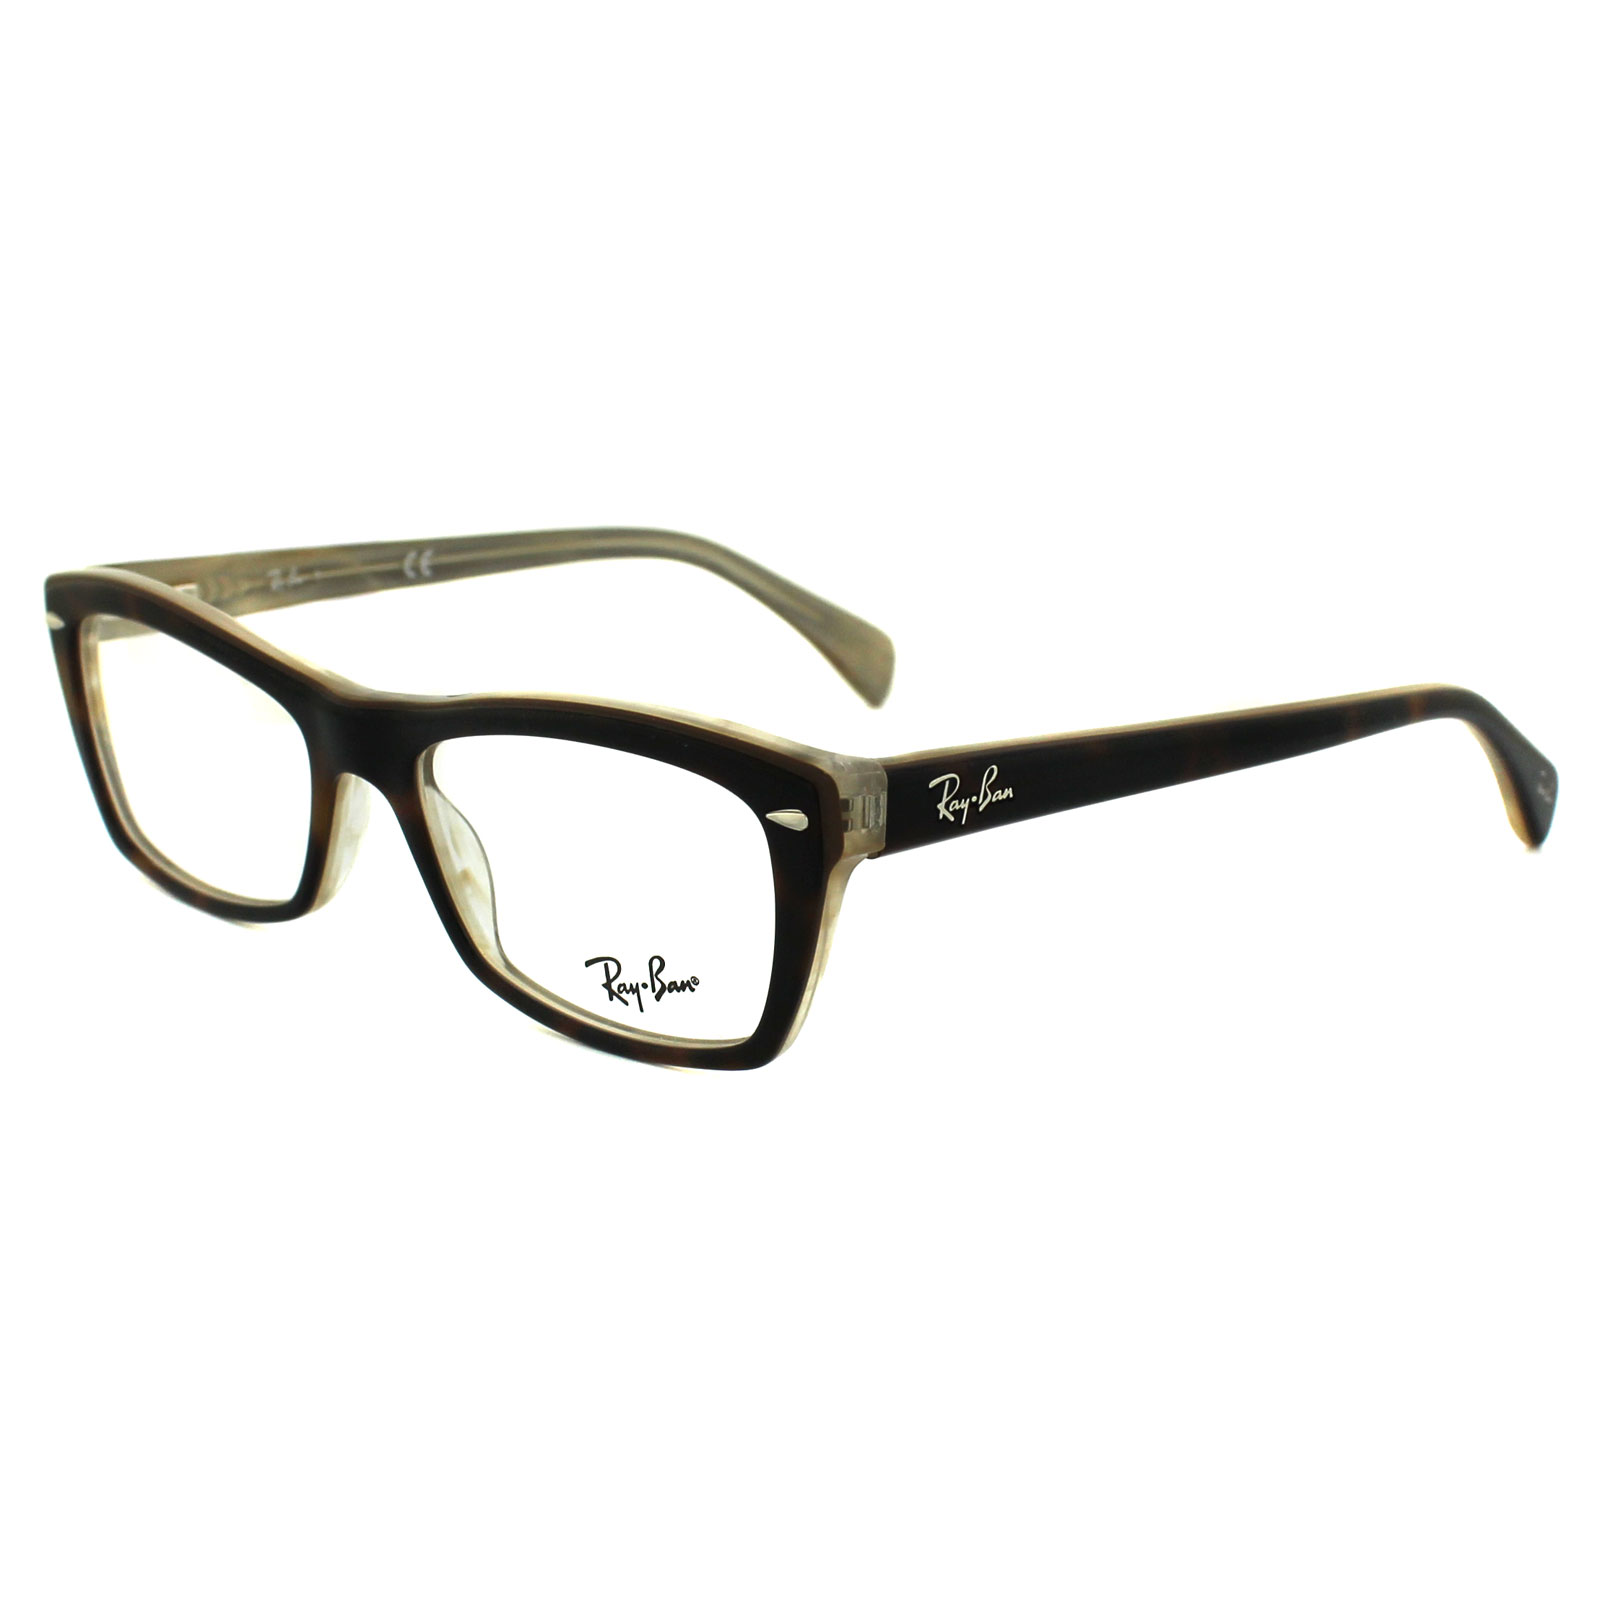 7d57a0806f ... sale sentinel ray ban glasses frames 5255 5075 havana transparent da0dc  b6550